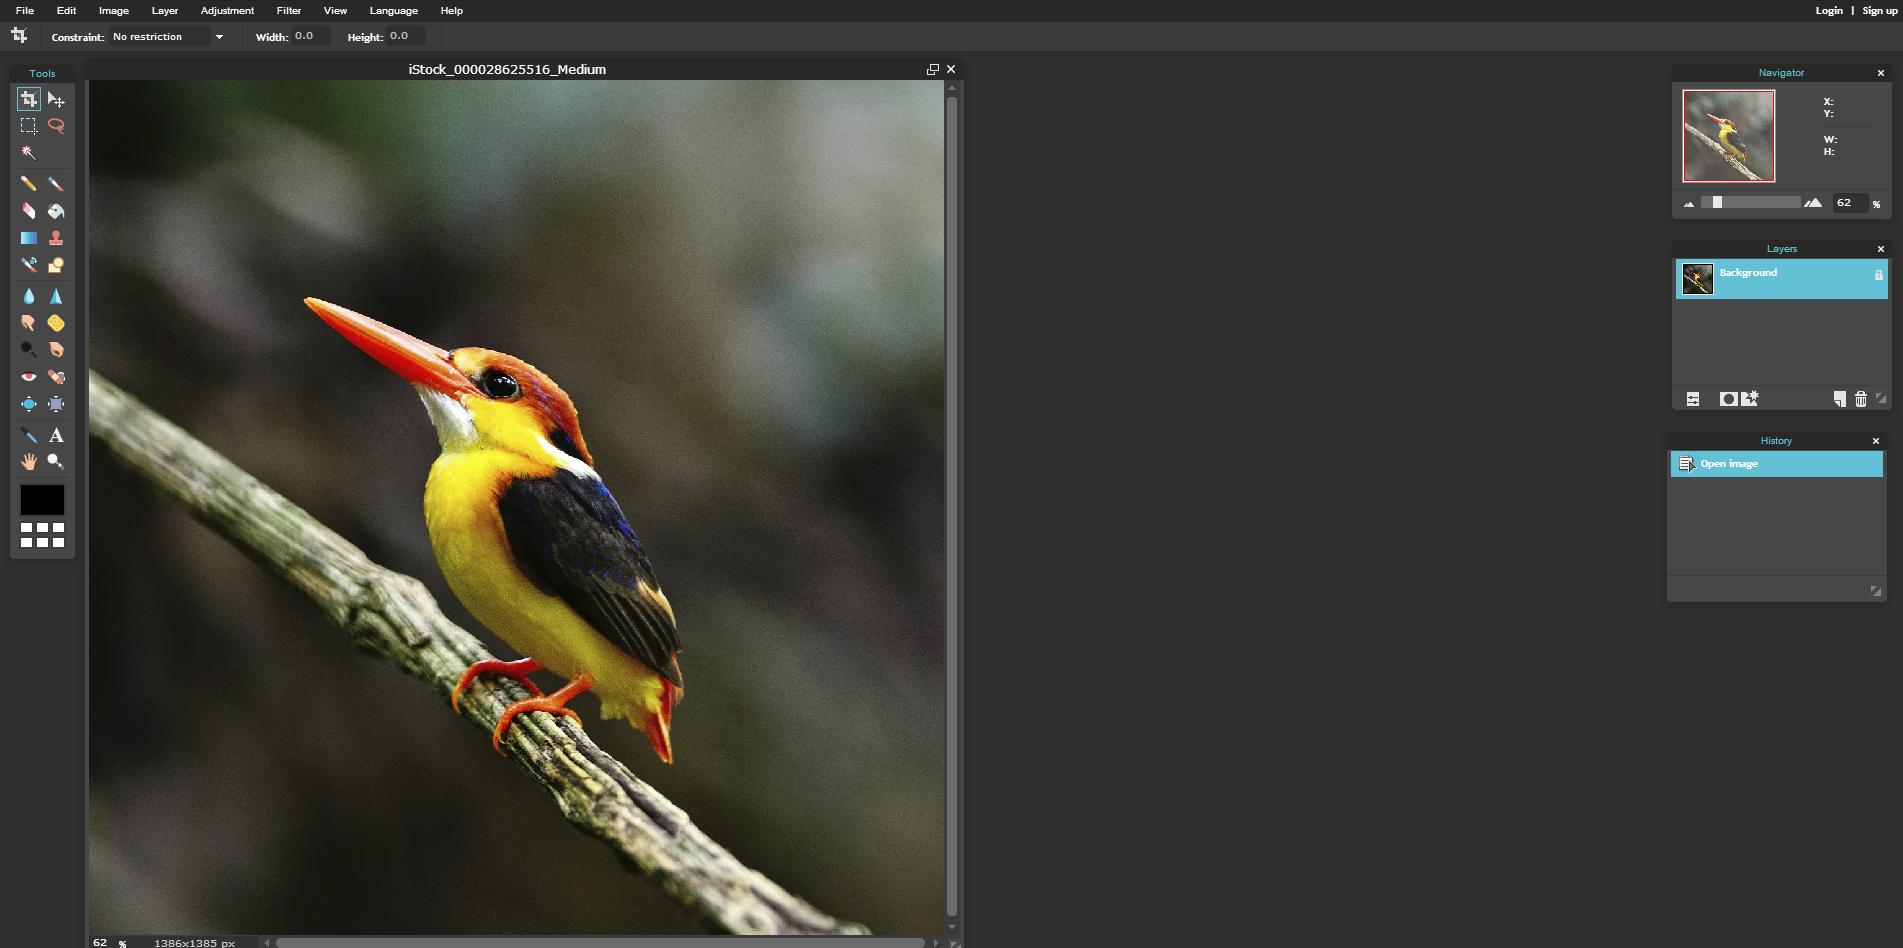 Online Photo Editor Pixlr Editor Autodesk Pixlr compressor image